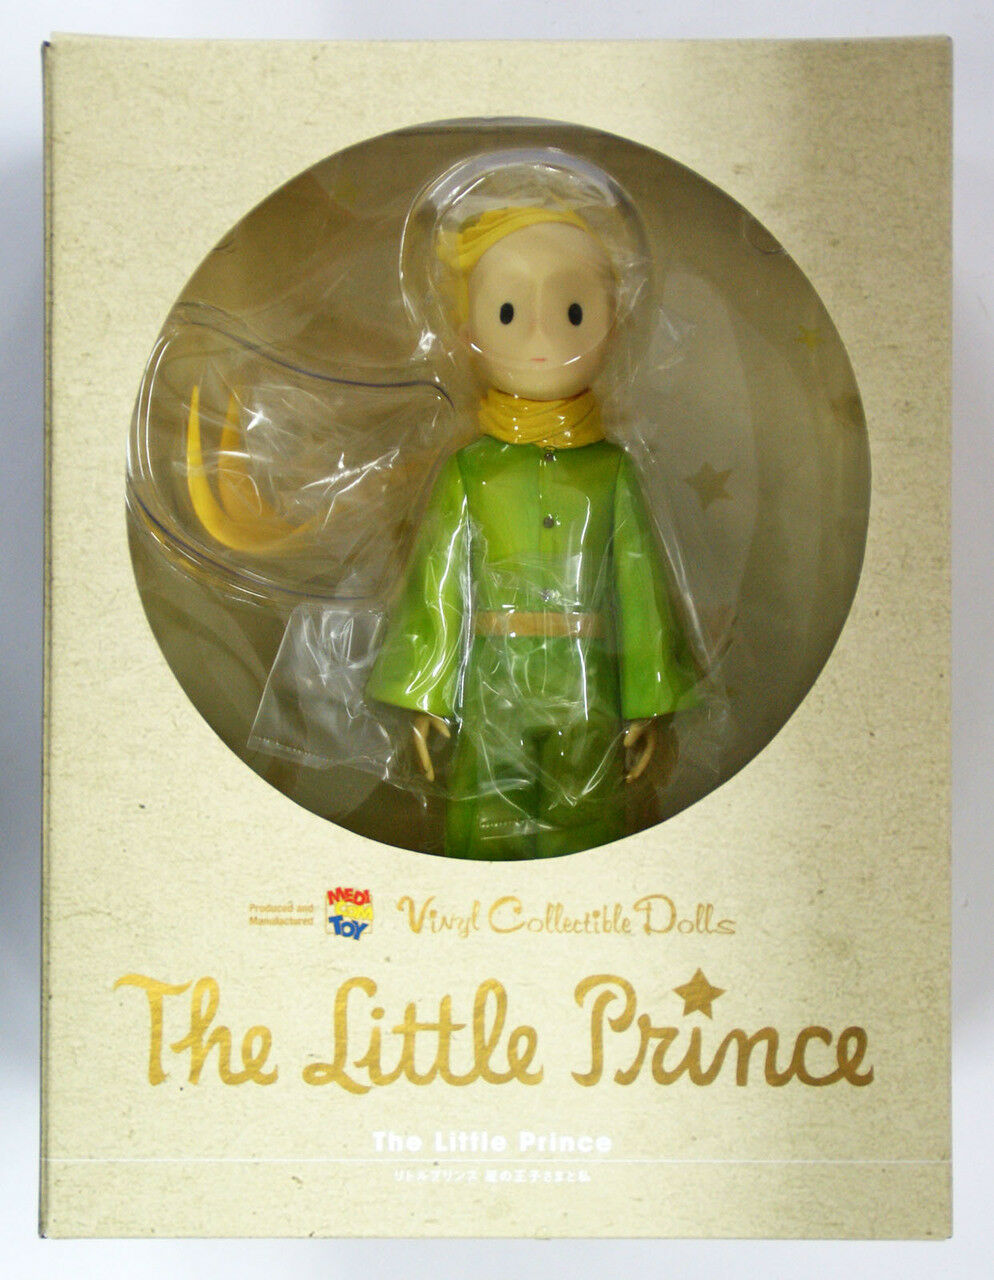 Medicom VCD-248 The Little Prince Le Petit Prince Vinyl Figure